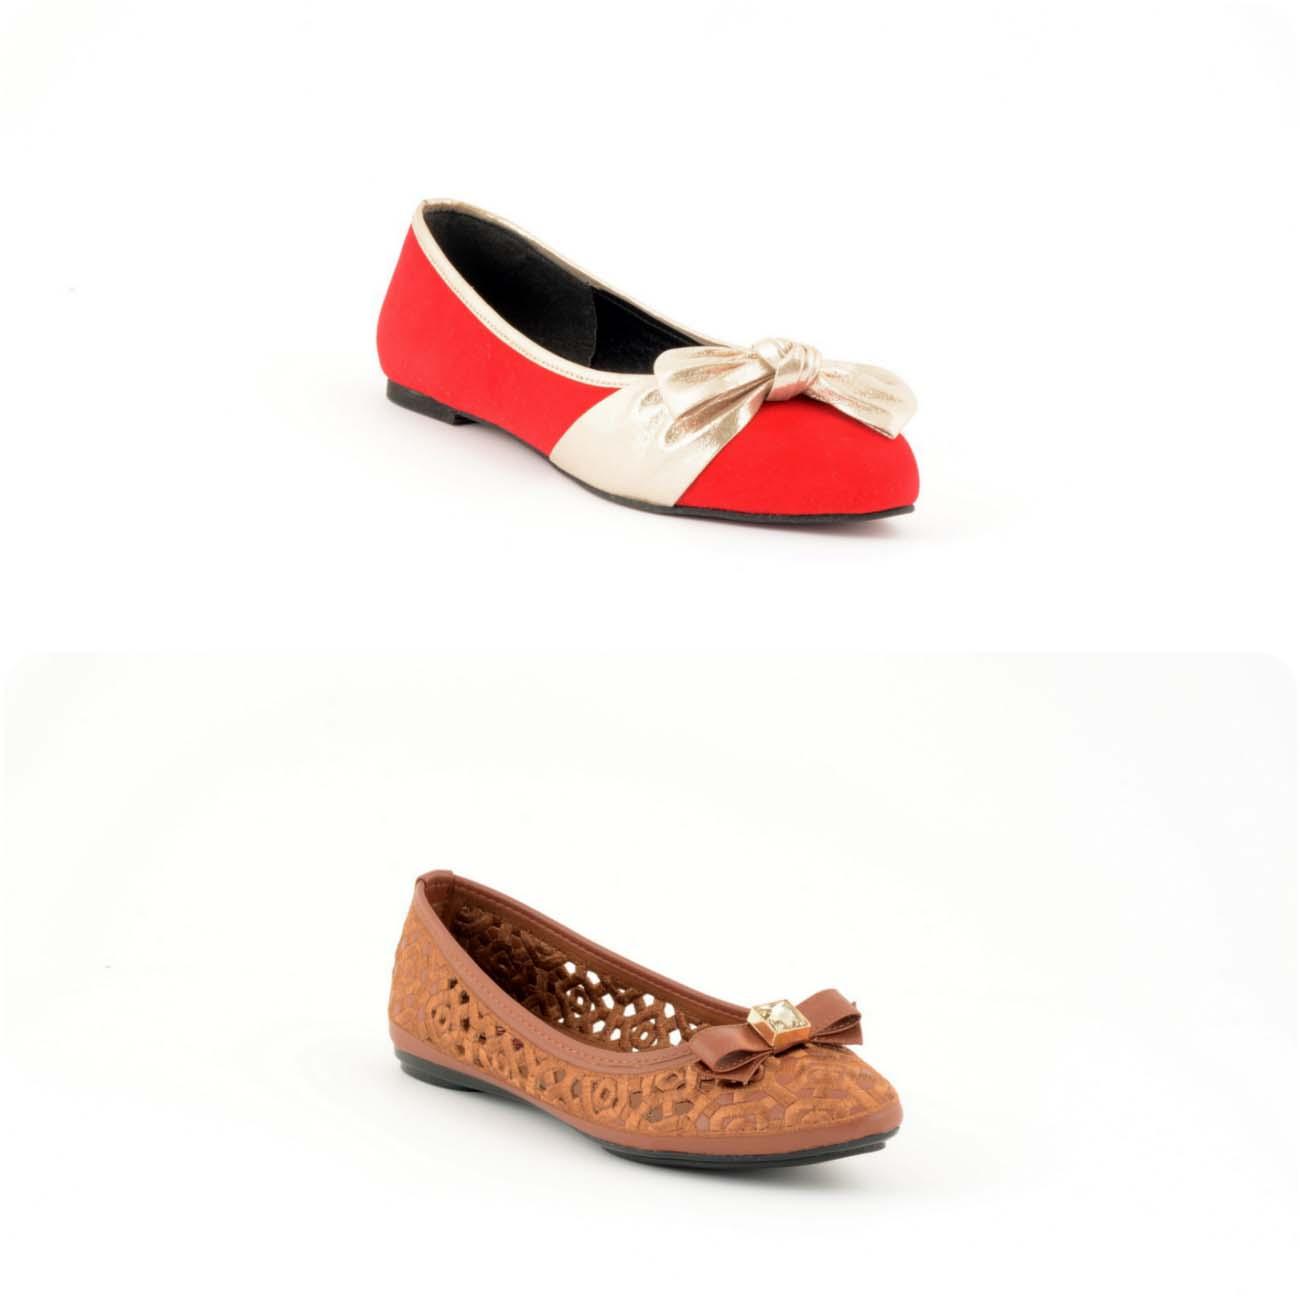 New SIKETU 2016 New Fashion Bohemia Women Sandals Wedges Rhinestone Women Shoes Drop Shoes Women ...